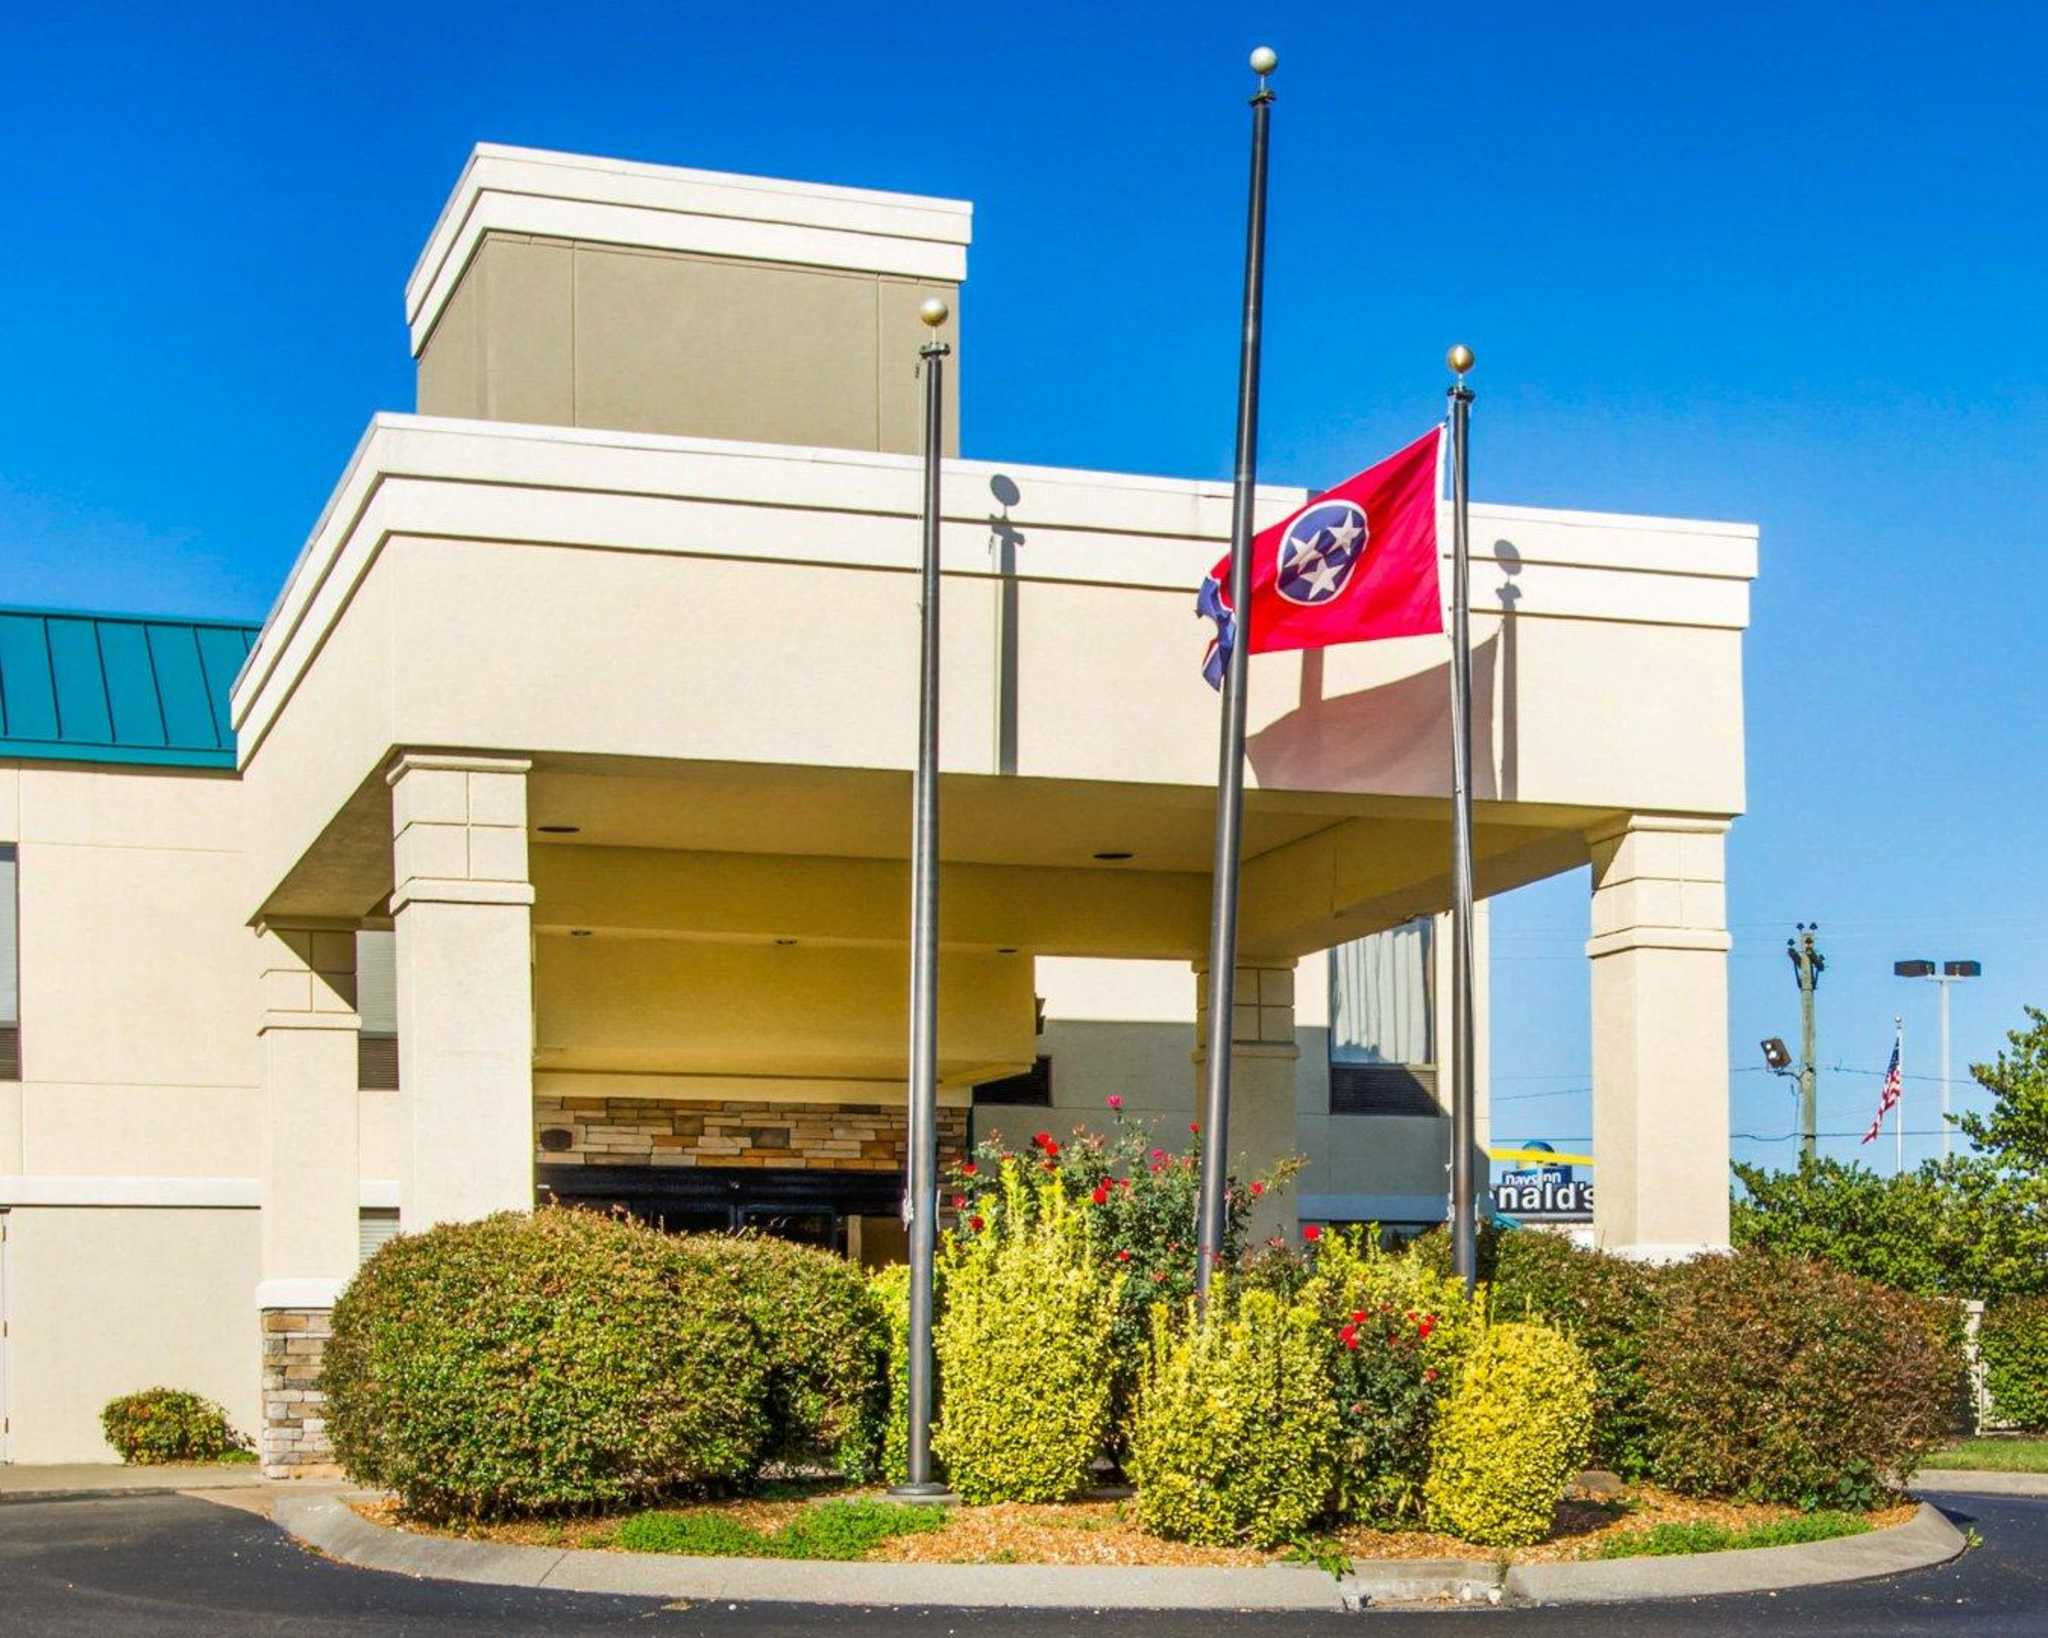 Hotels Near Winfield Dunn Center Austin Peay Smoke Free Hotel Clarksville Montgomery Business Park Interstate I 24 At Tn 76 2 Floors